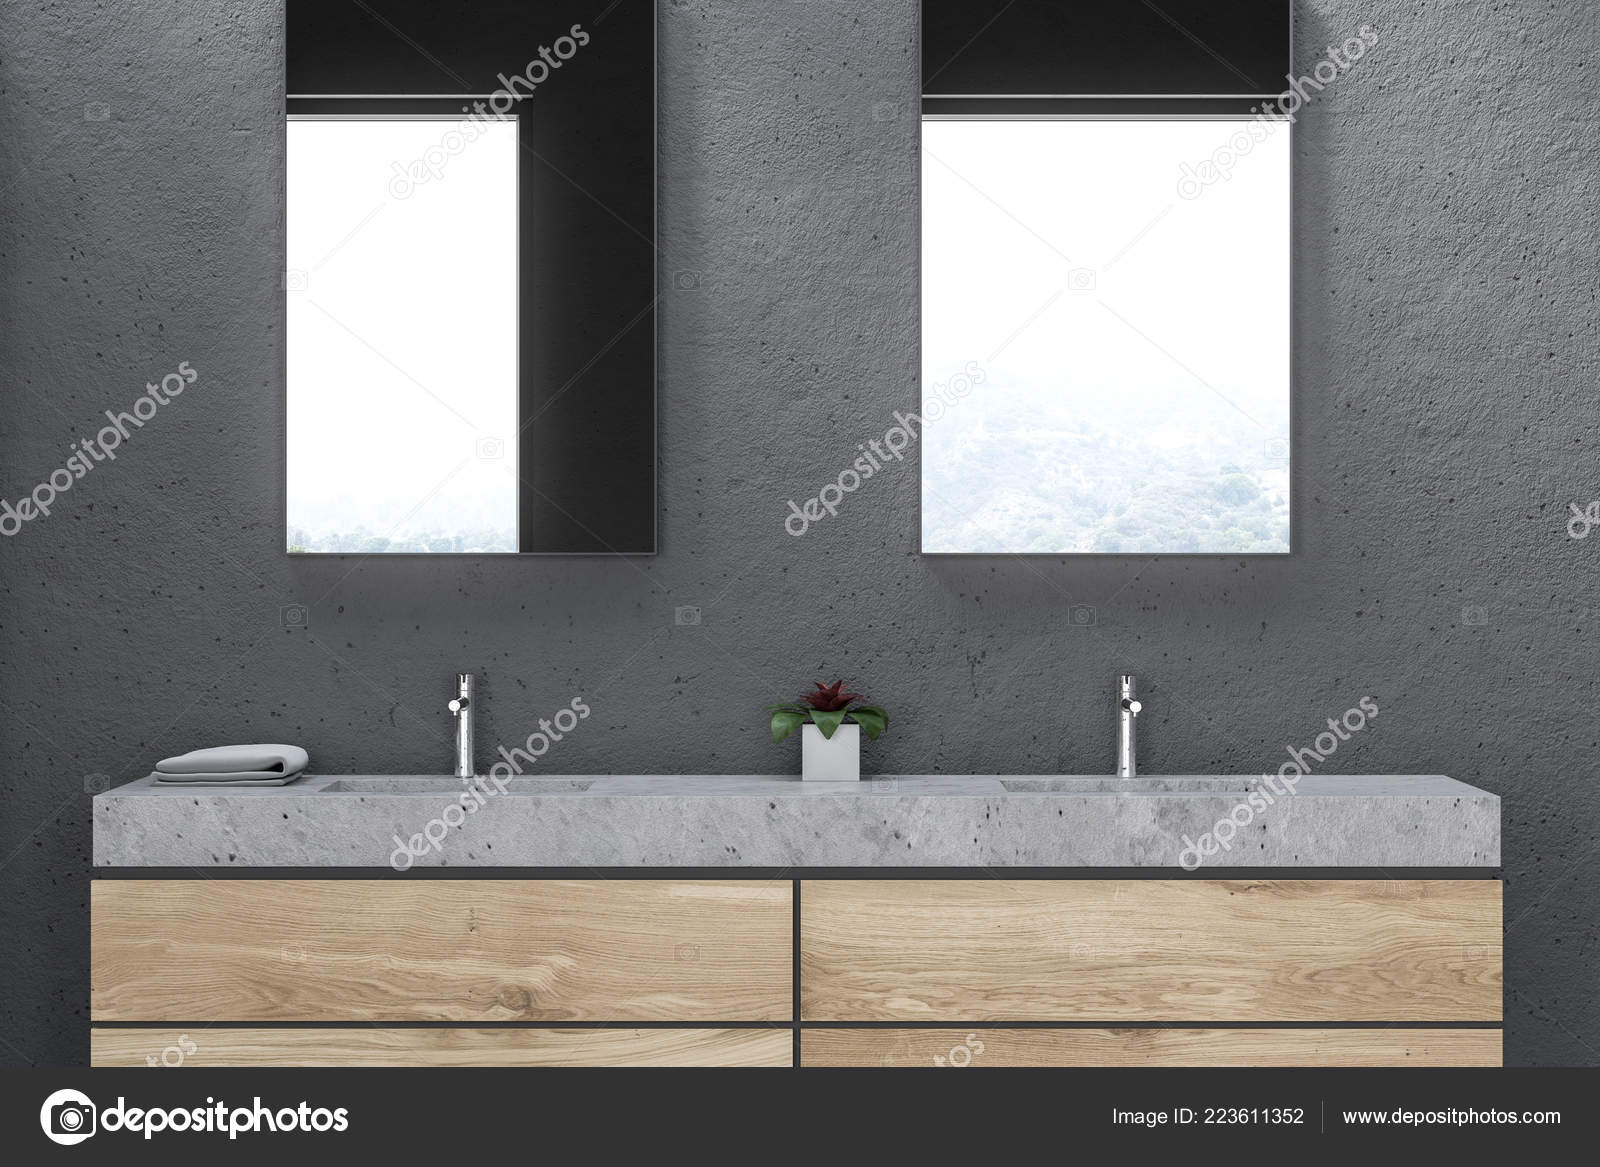 Gros Plan Salle Bain Double Vasque Marbre Tenant Debout Sur